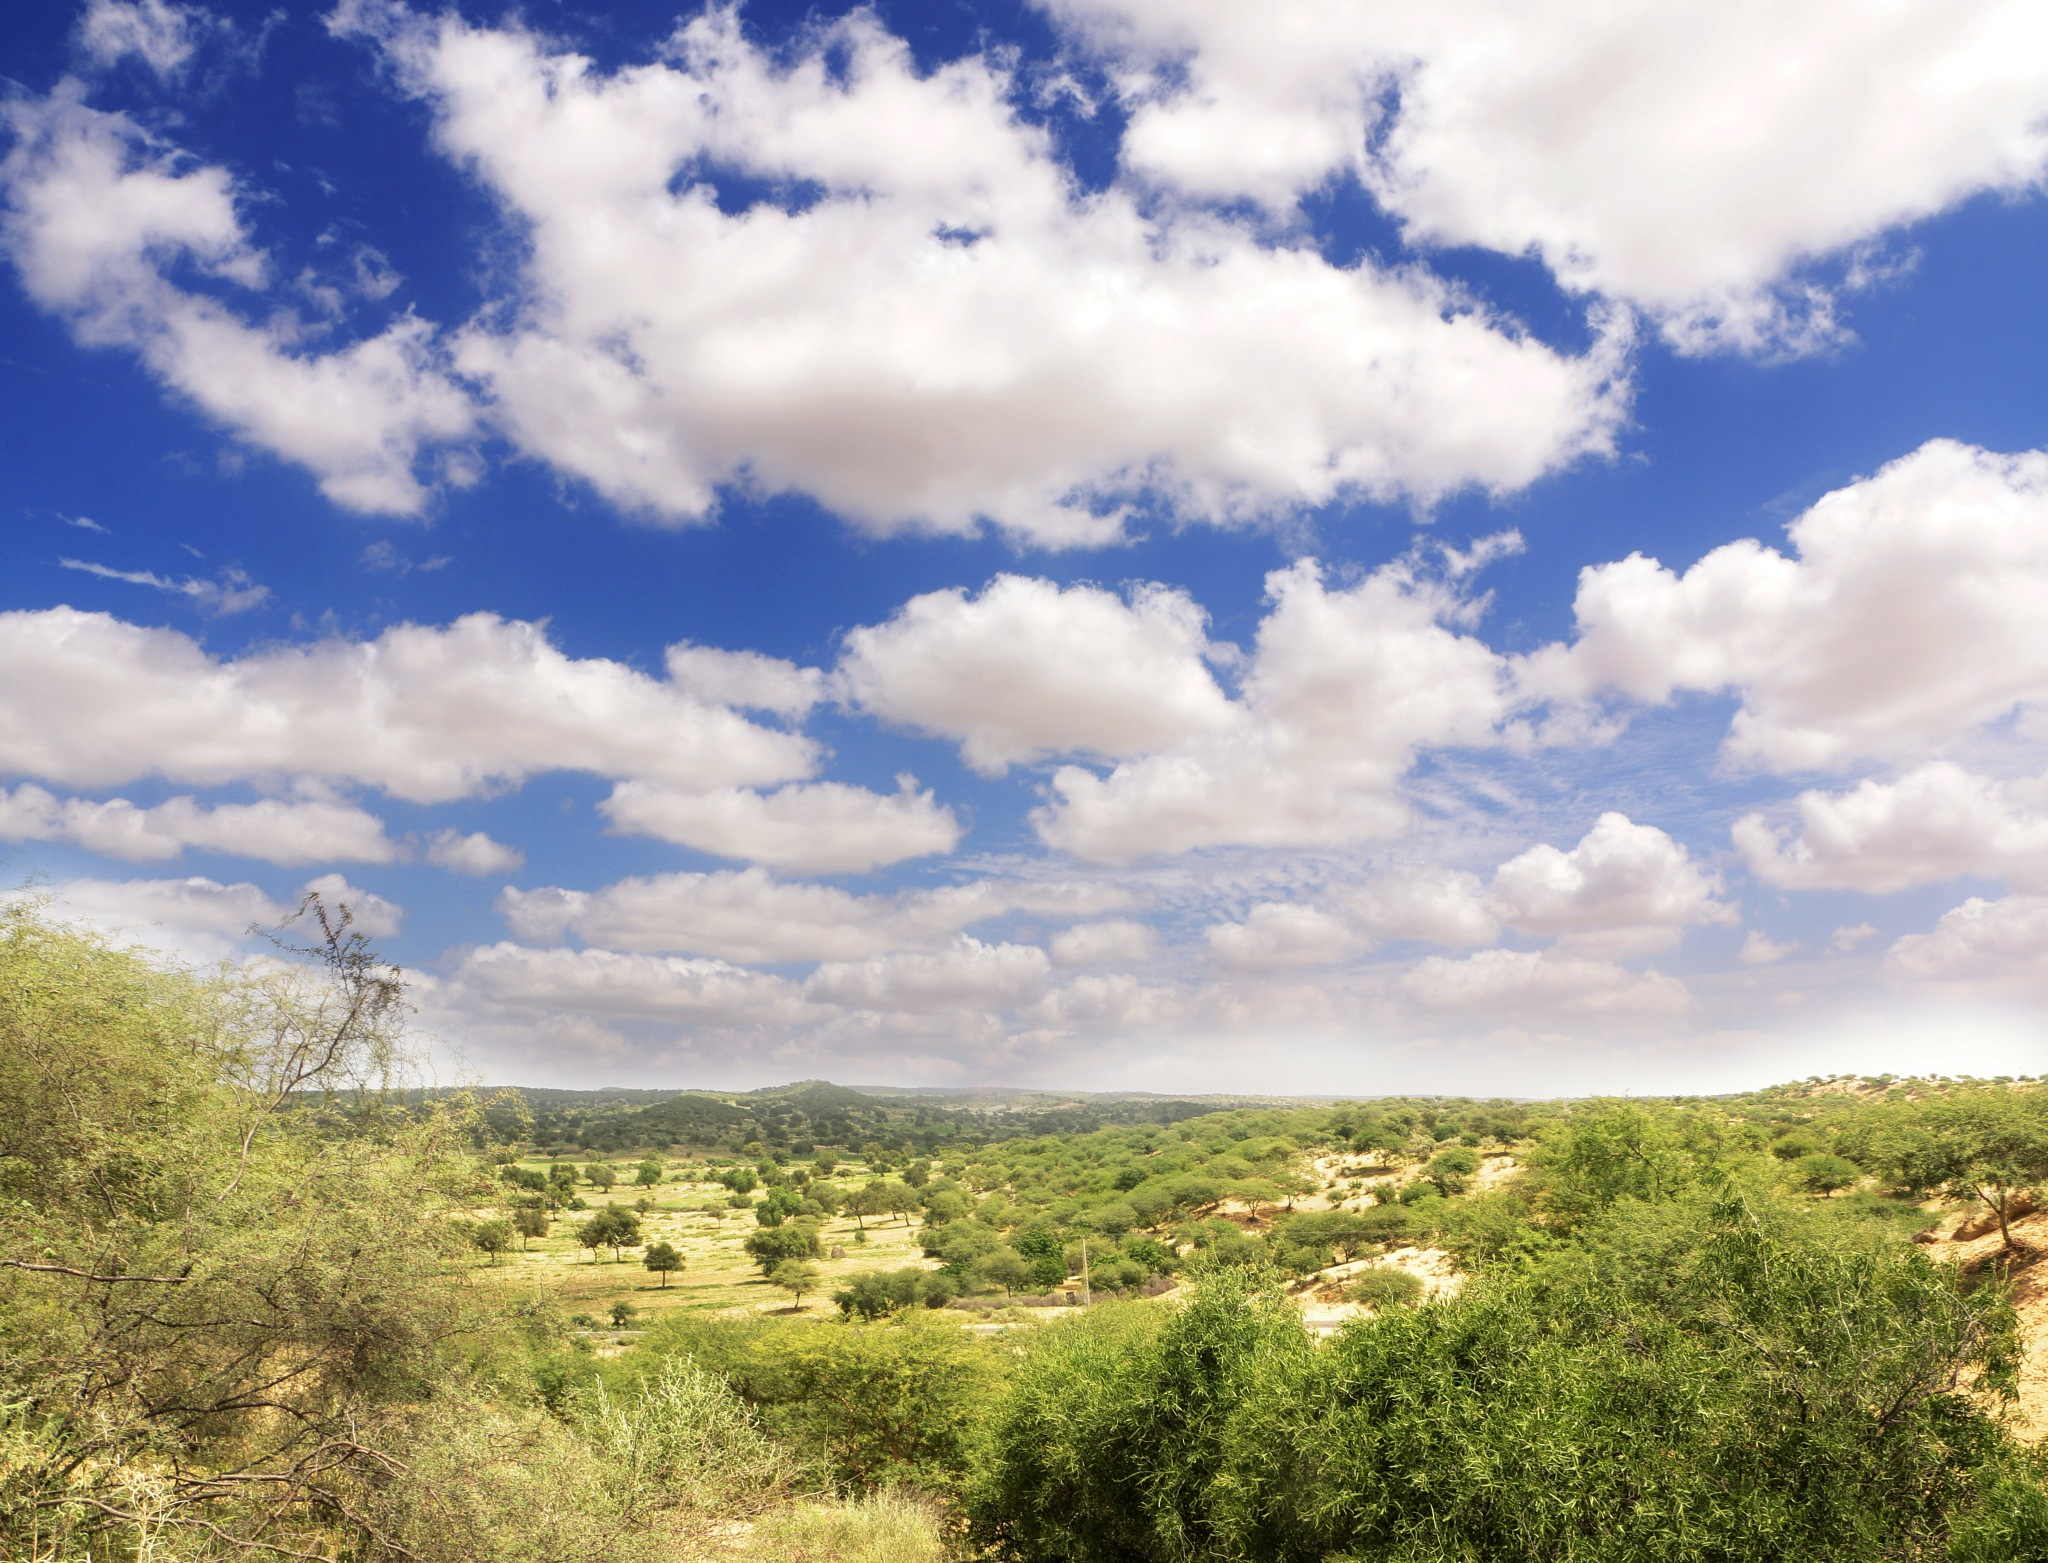 Green Thar Desert Pakistan by Manoj Kumar Genani